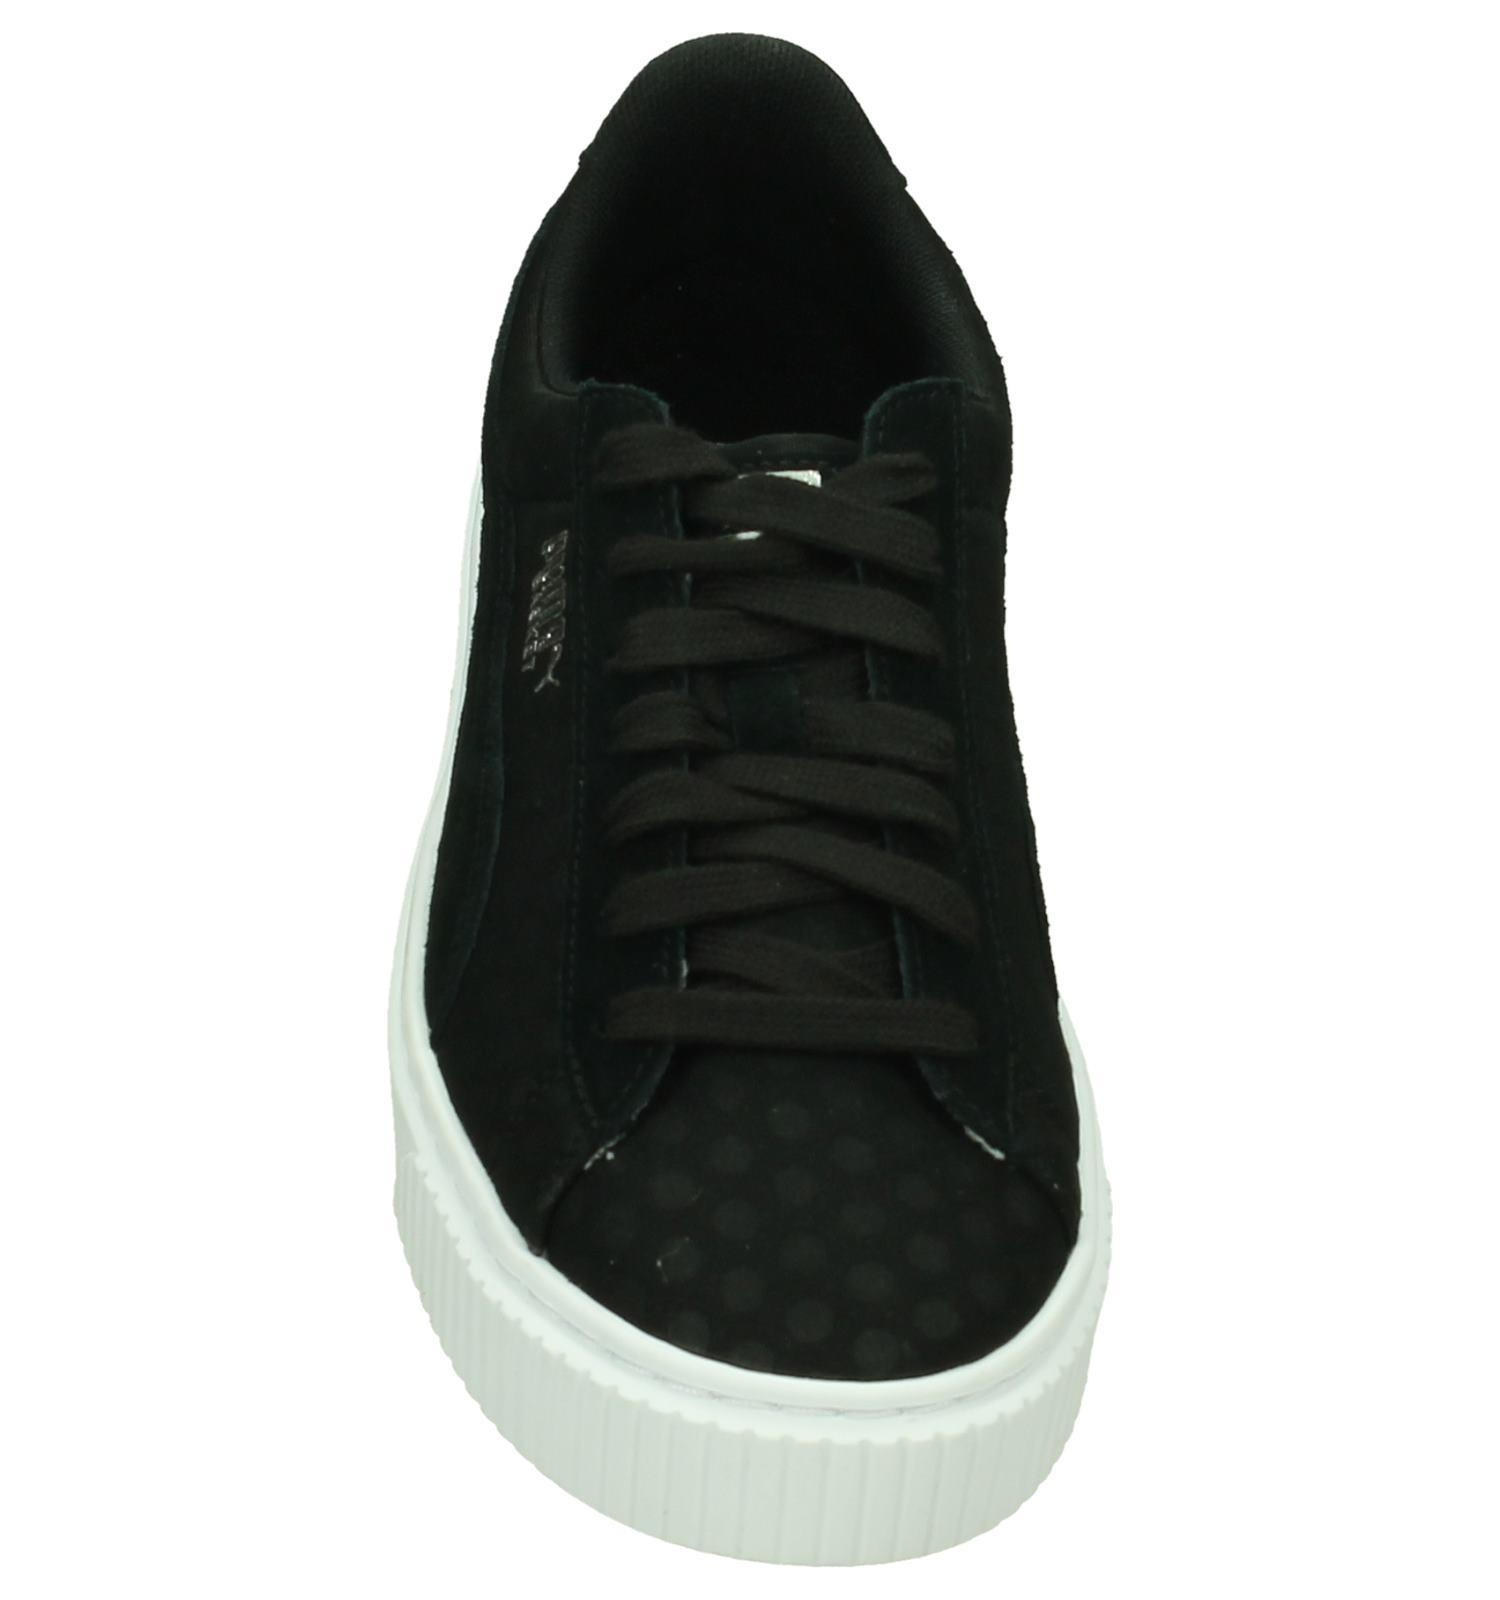 Puma Basket Platform Zwarte Sneakers | TORFS.BE | Gratis verzend en retour